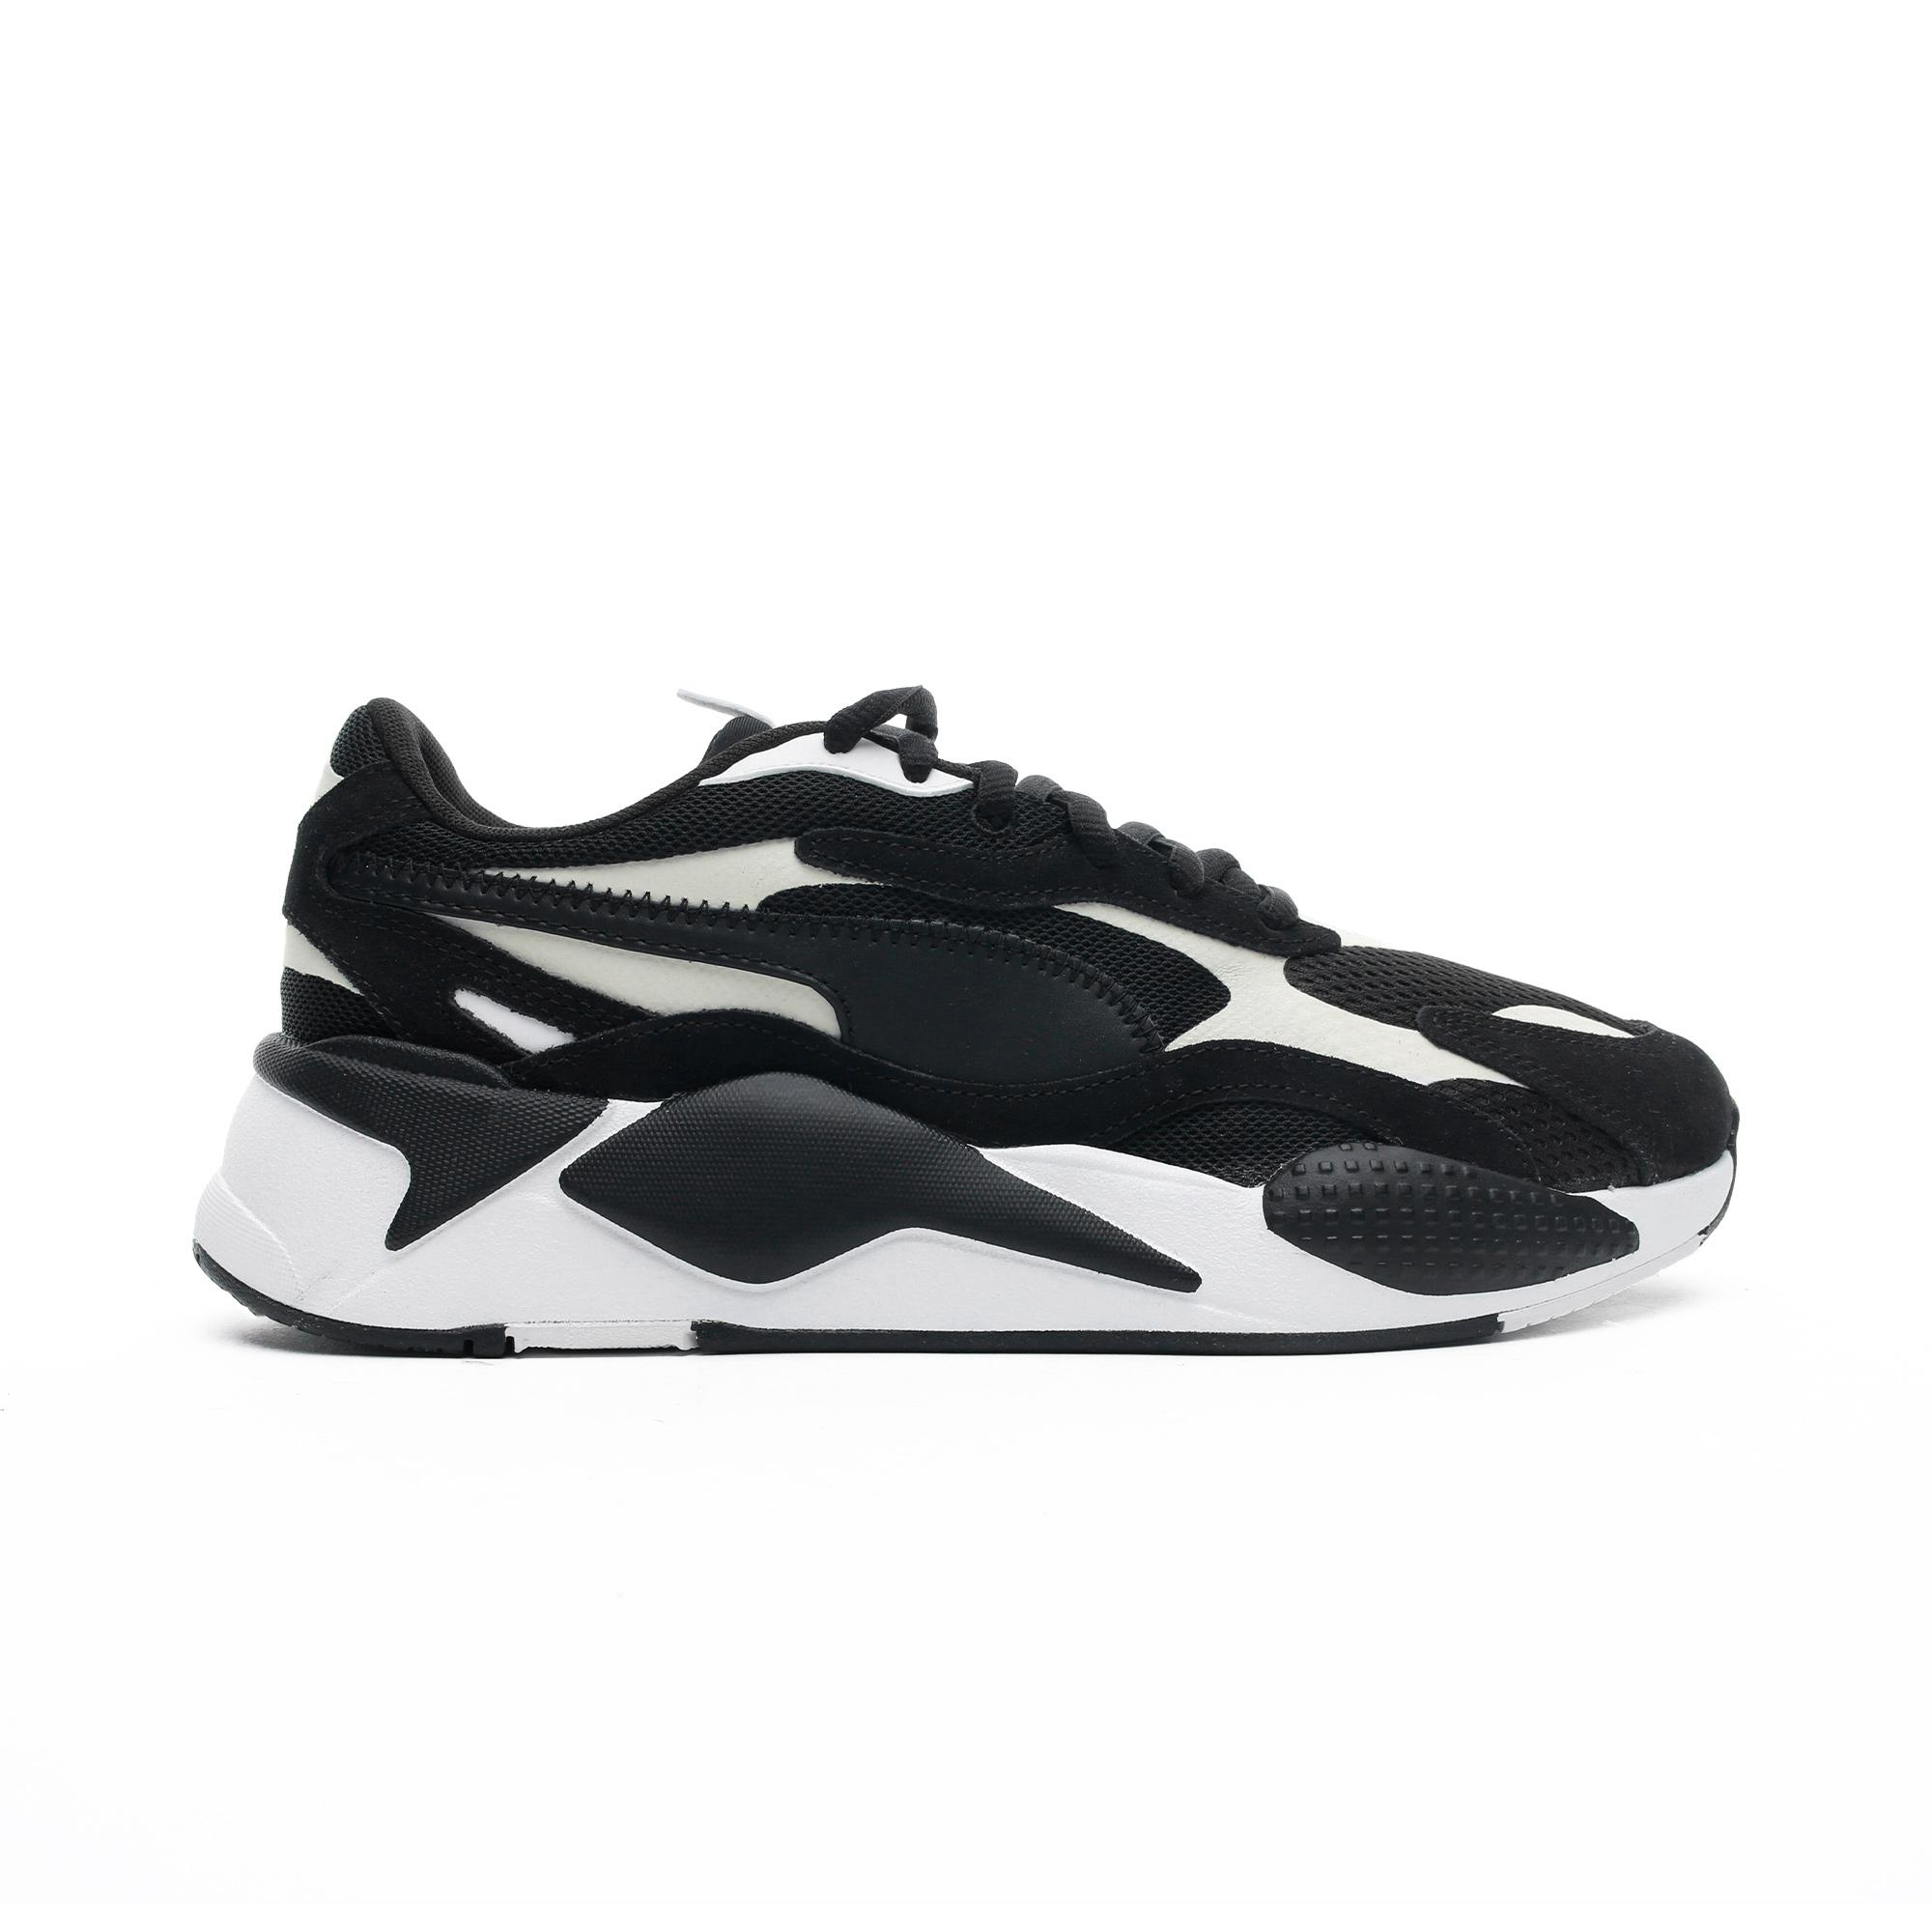 Puma RS-X³ Superite Erkek Siyah Spor Ayakkabı